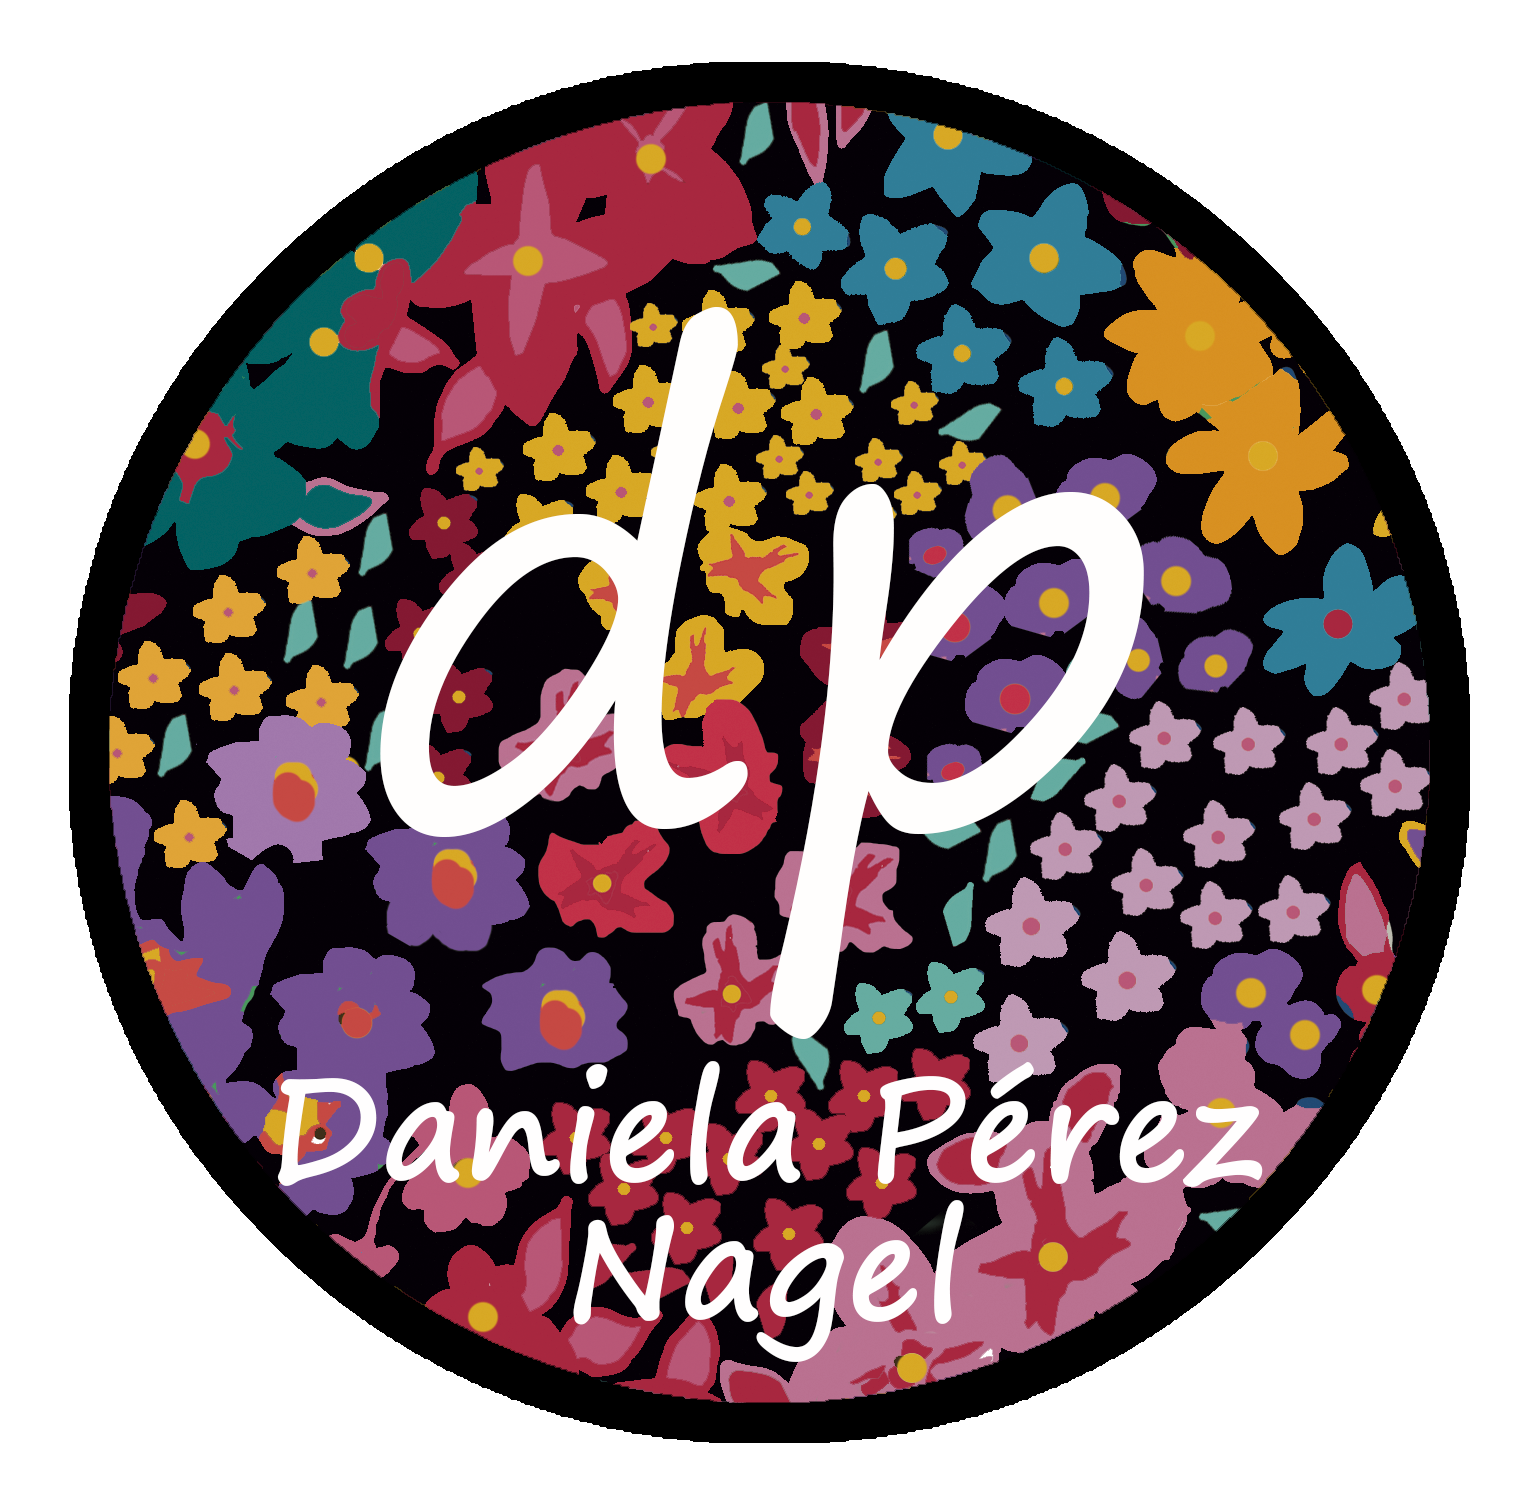 Daniela Pérez Nagel